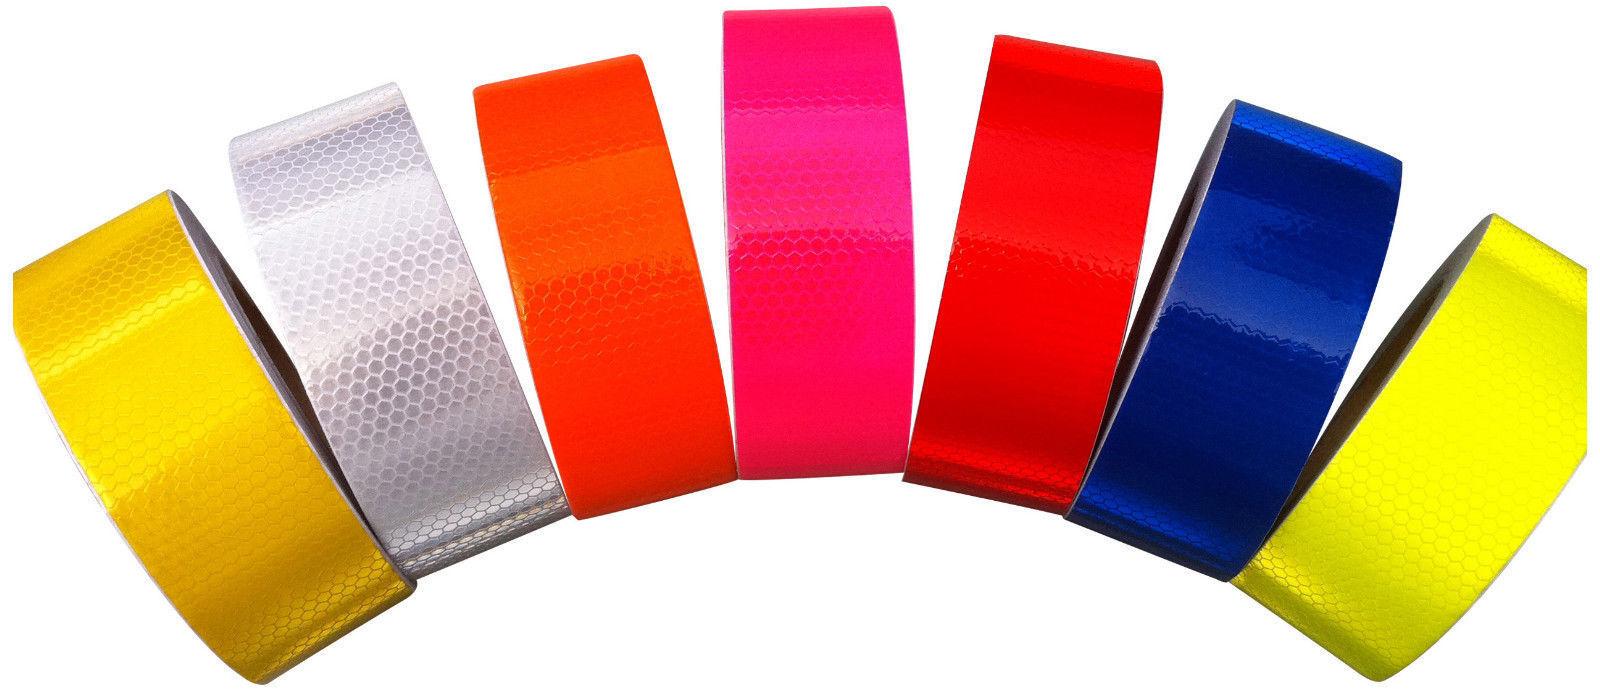 New High Intensity Reflective Tape Vinyl 25mm, 50mm, 100mm, 150mm widths